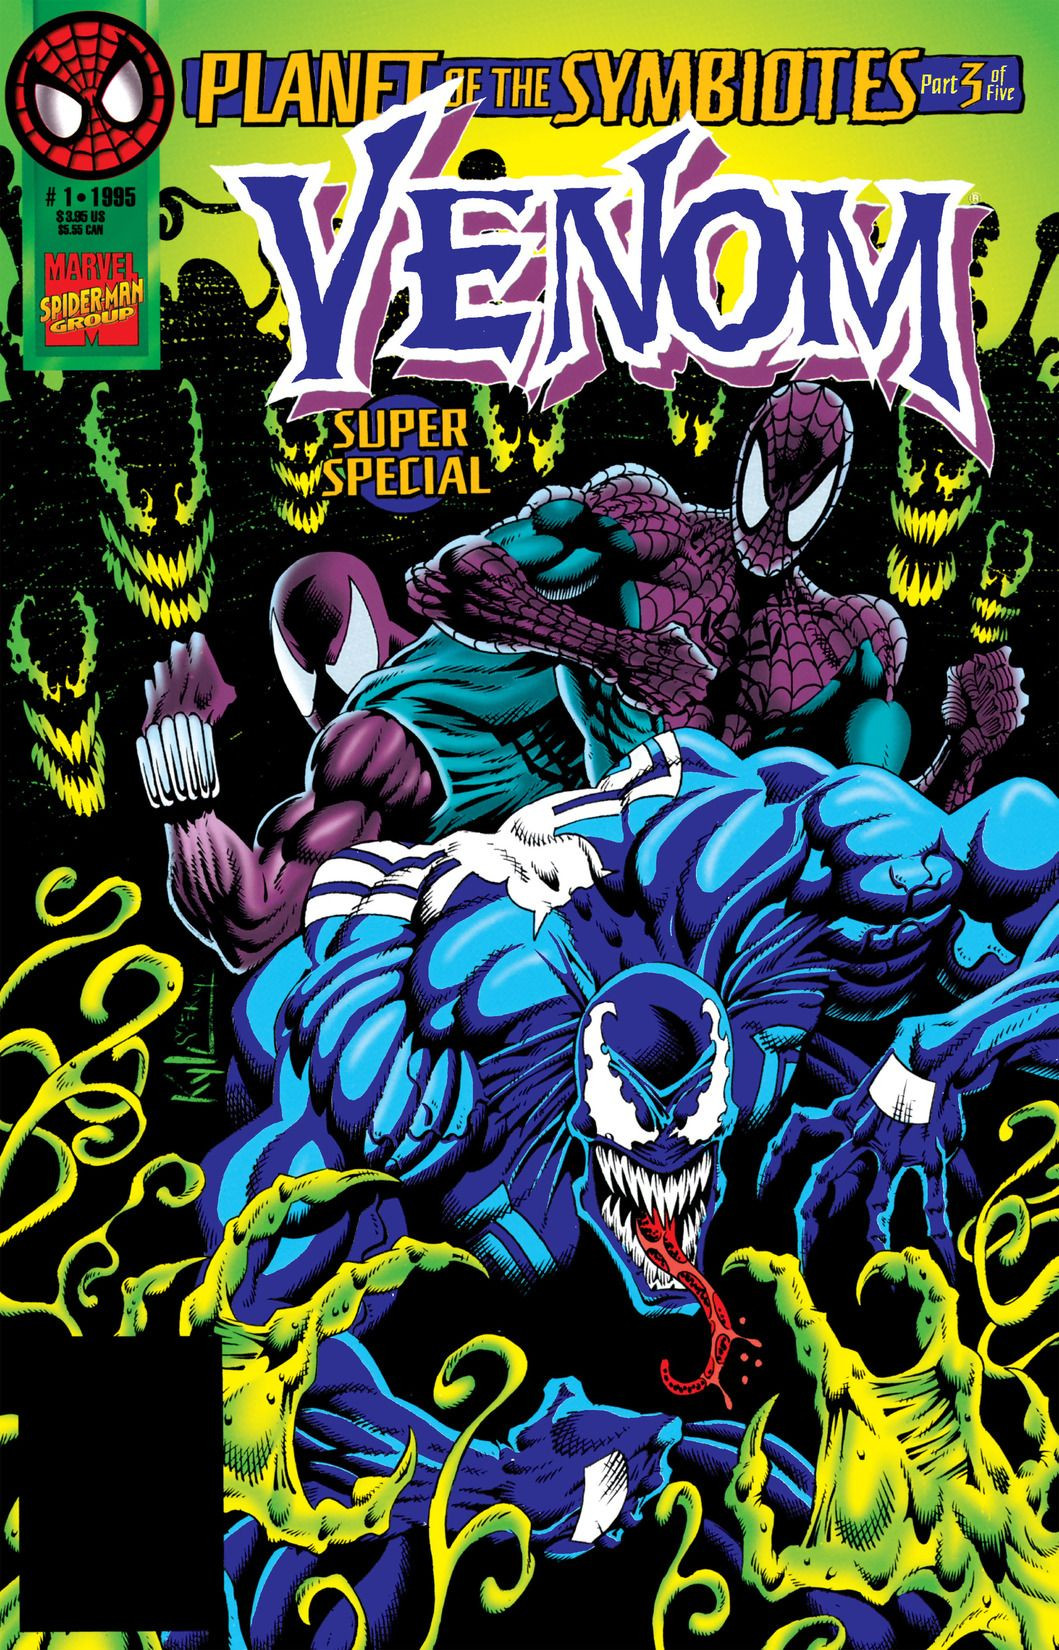 Venom_Planet_of_the_Symbiotes